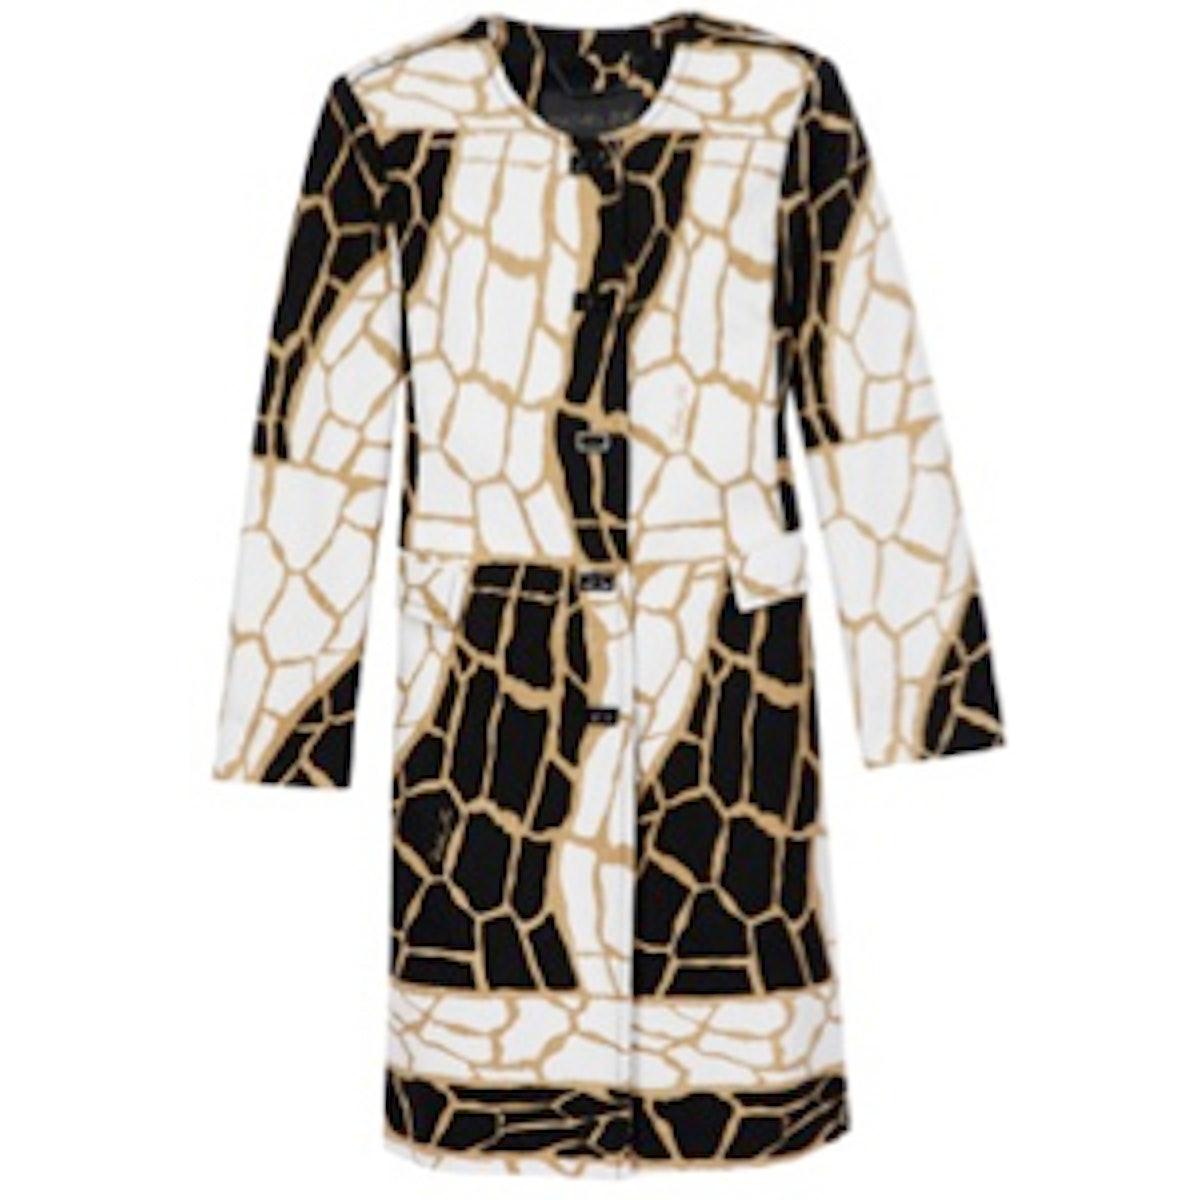 Mena Giraffe Print Coat